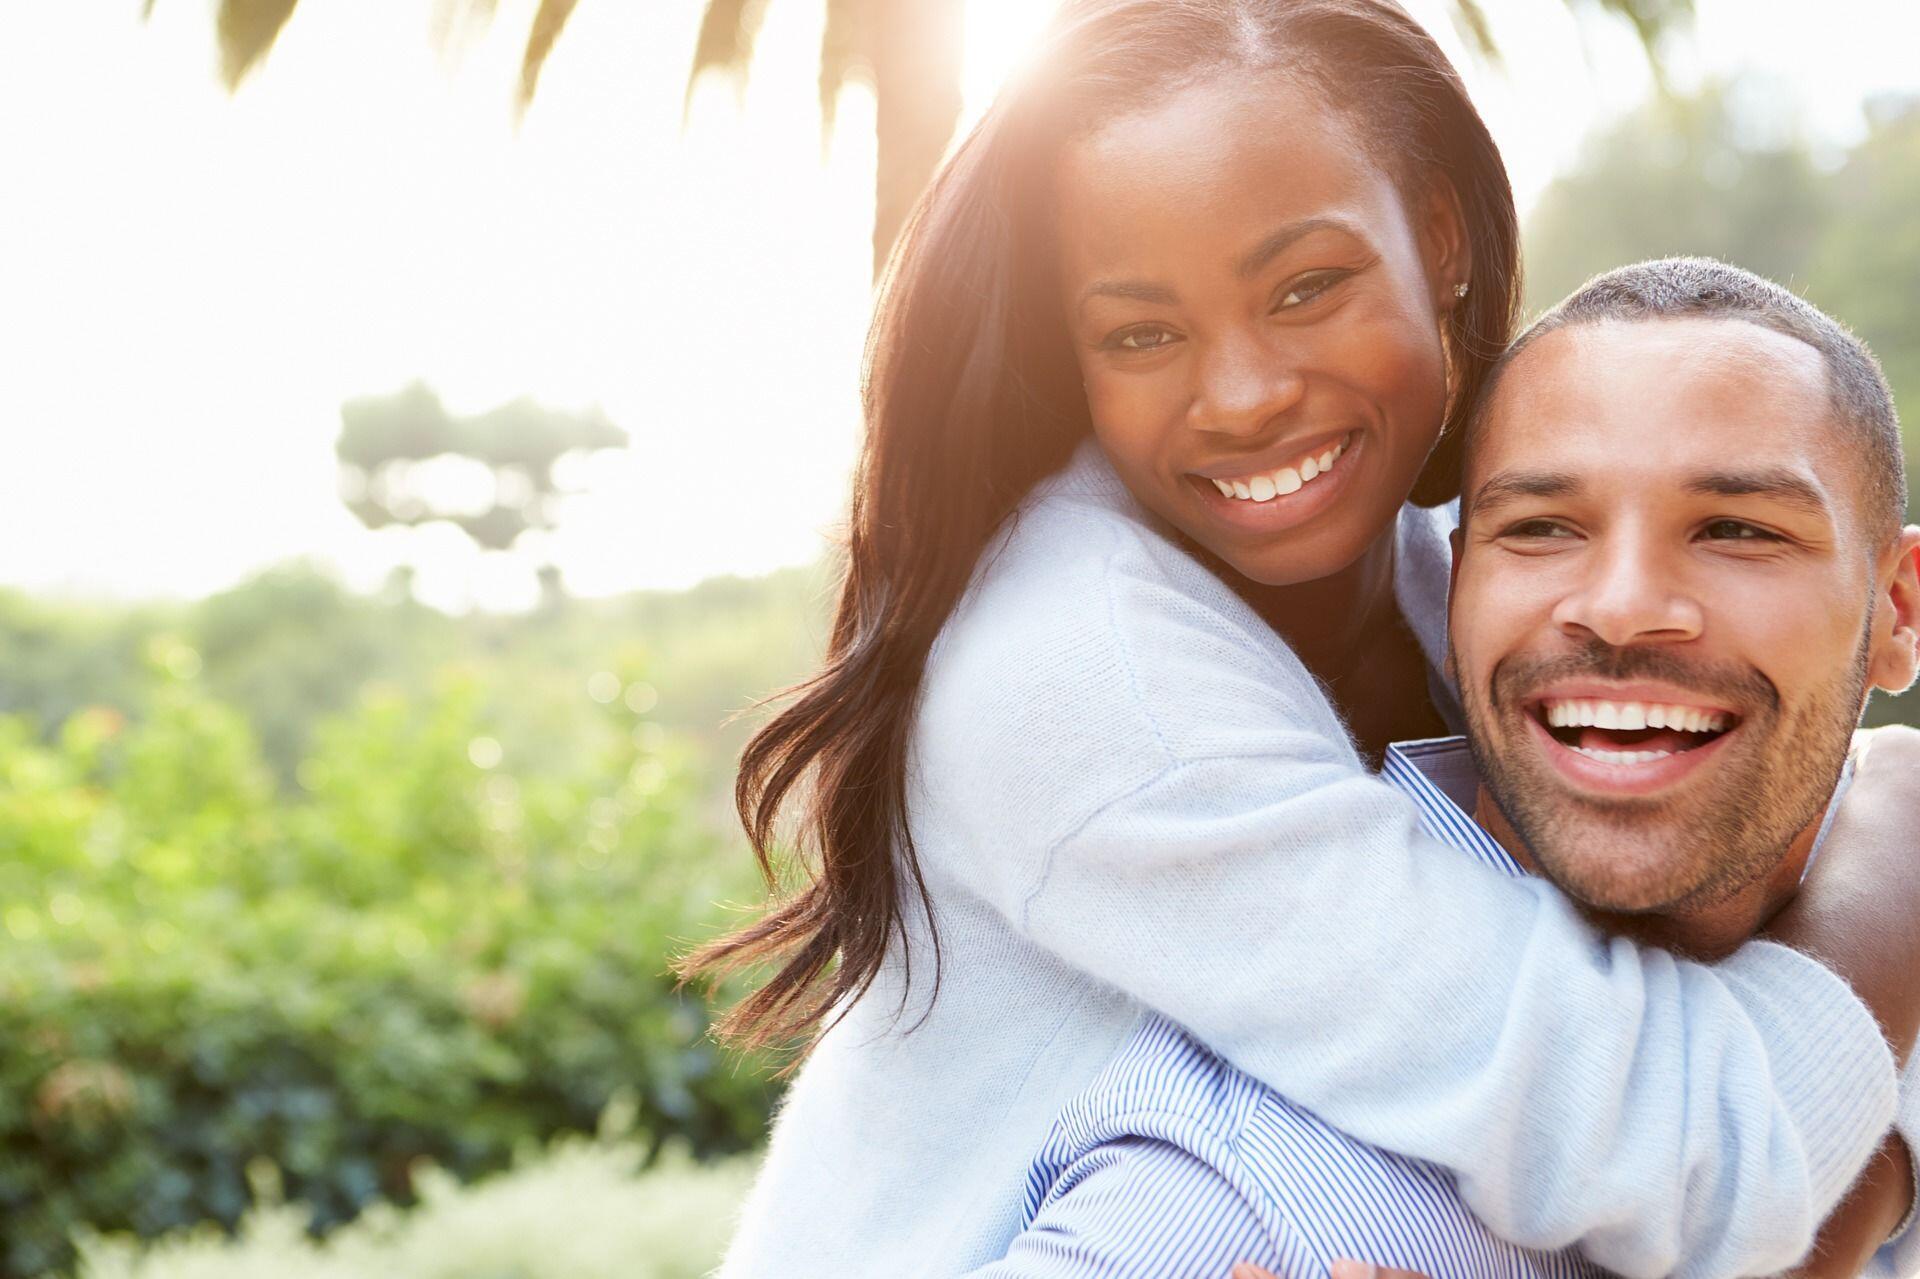 Pasangan Kurang Romantis? Lakukan 6 Trik Ini Untuk Memancingnya!